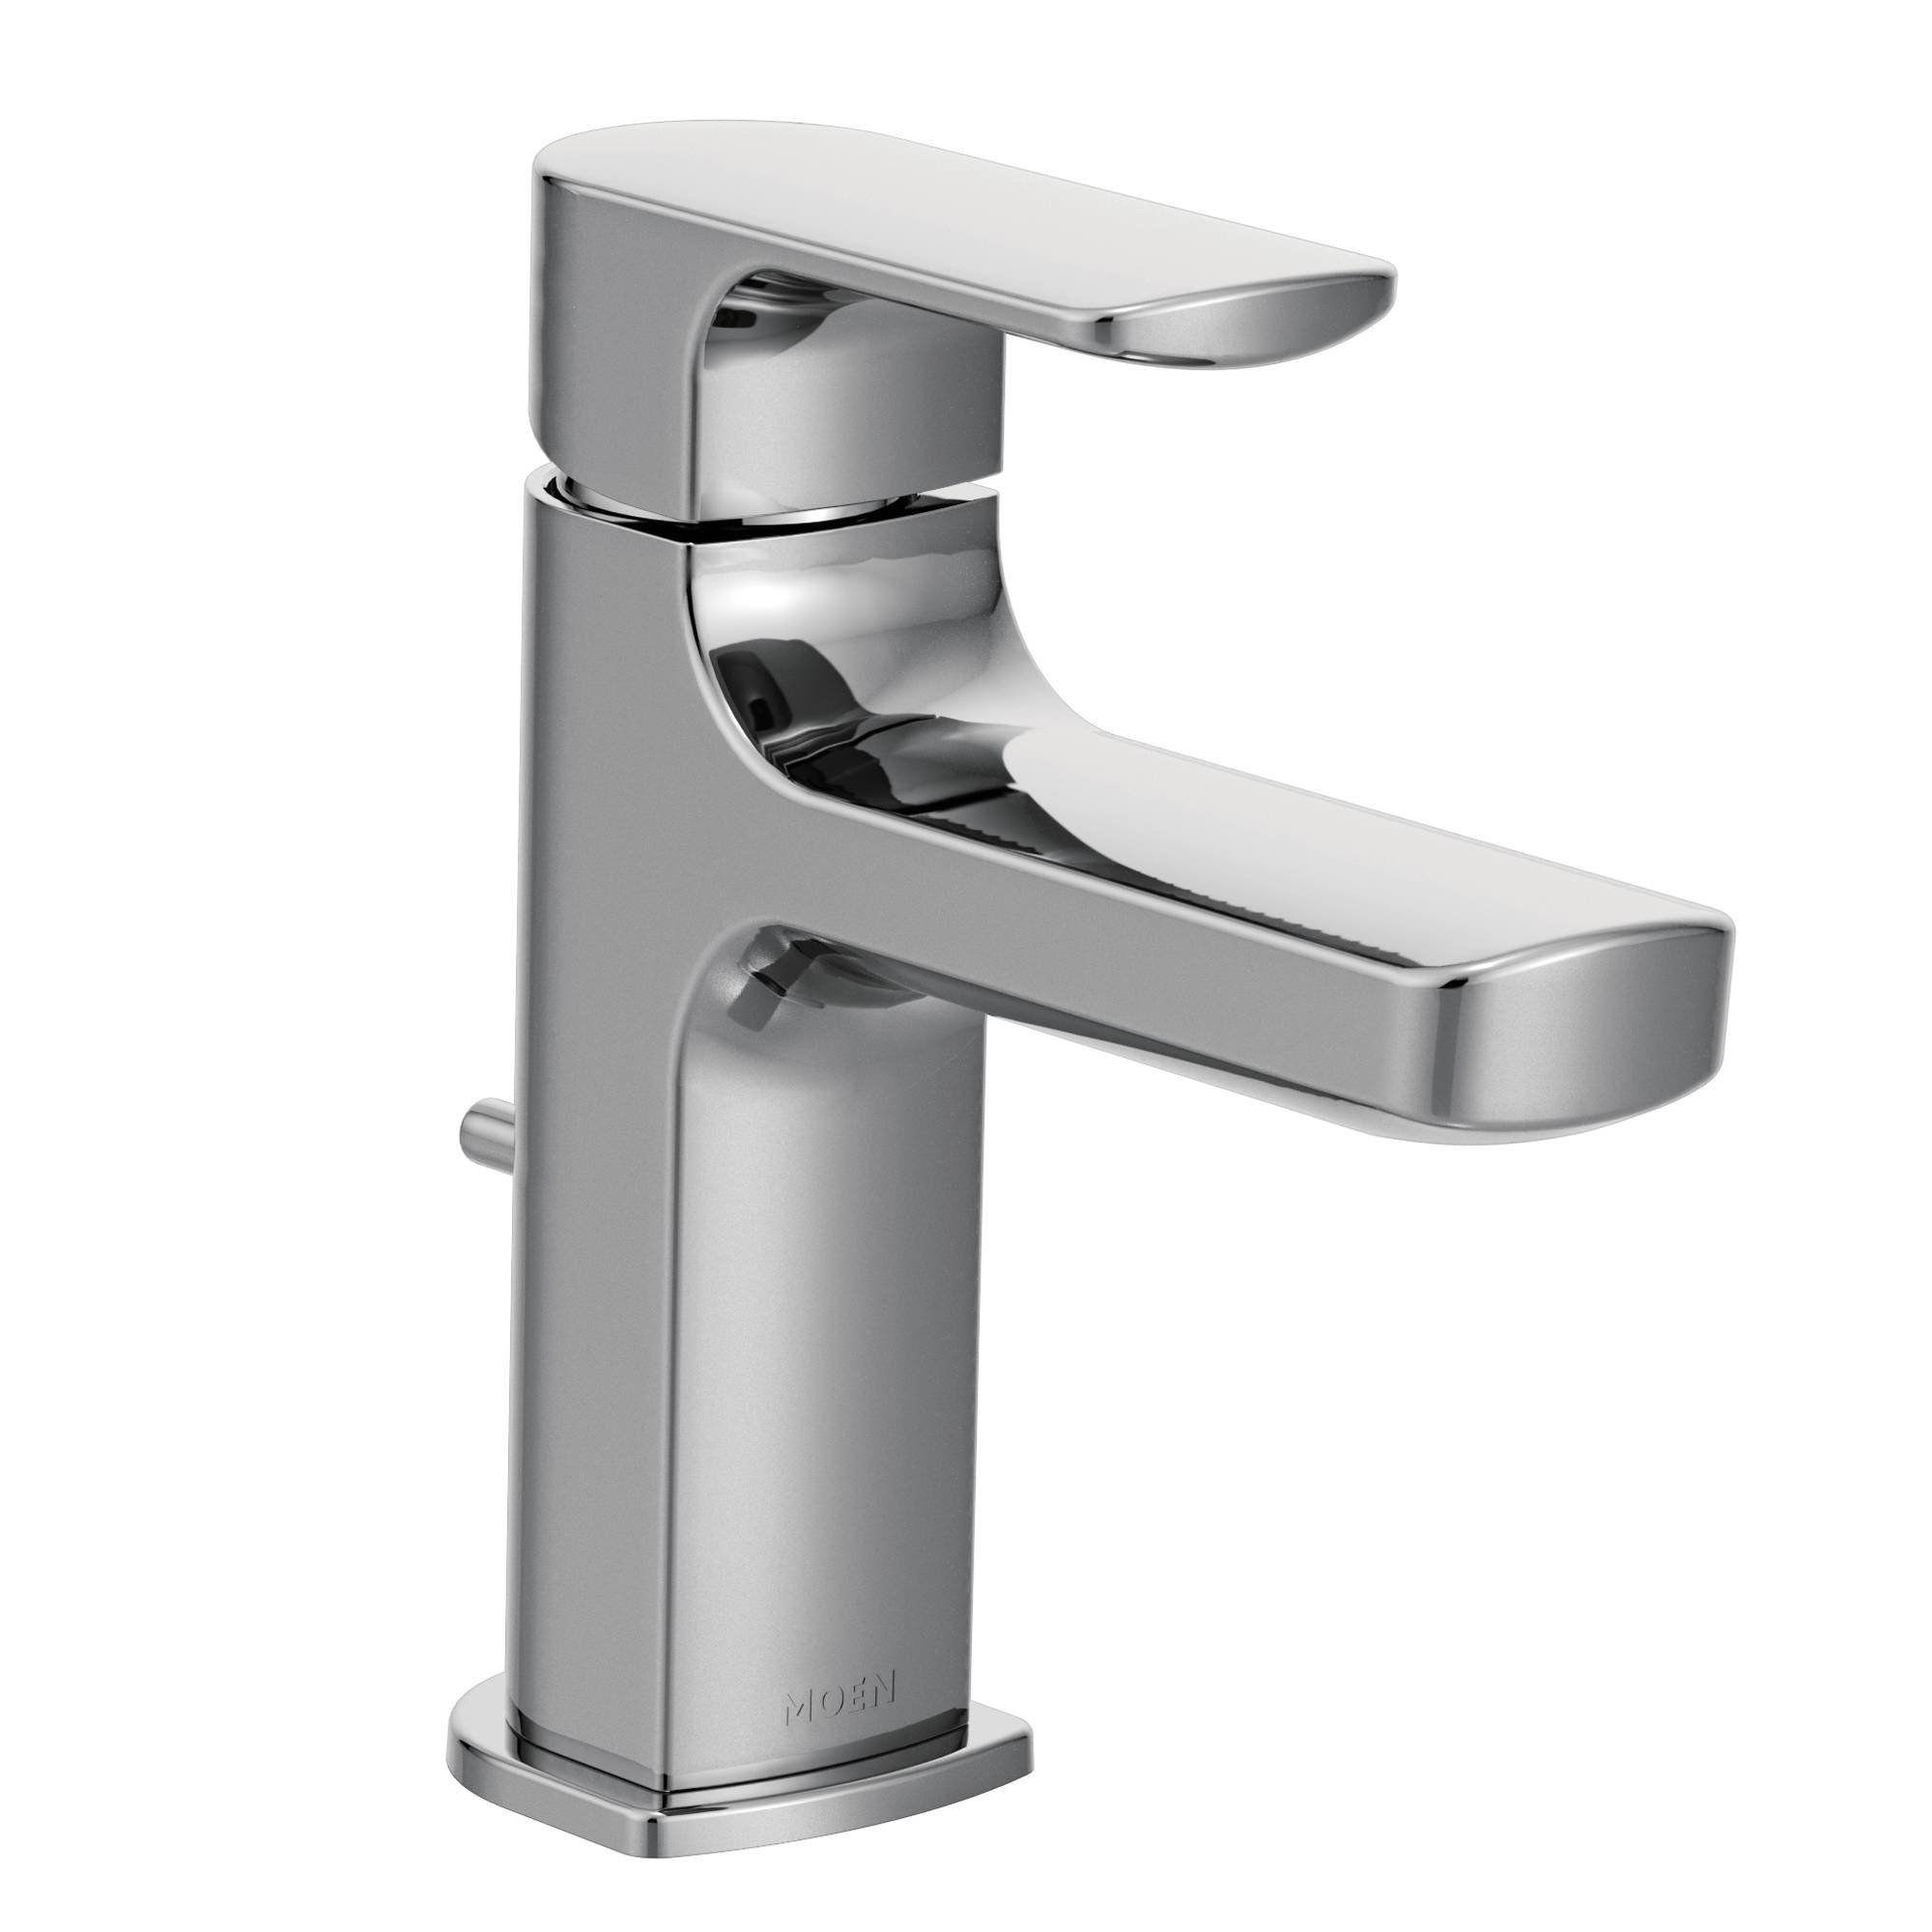 handle high faucet chrome bathroom sink american standard inch studio arc faucets widespread